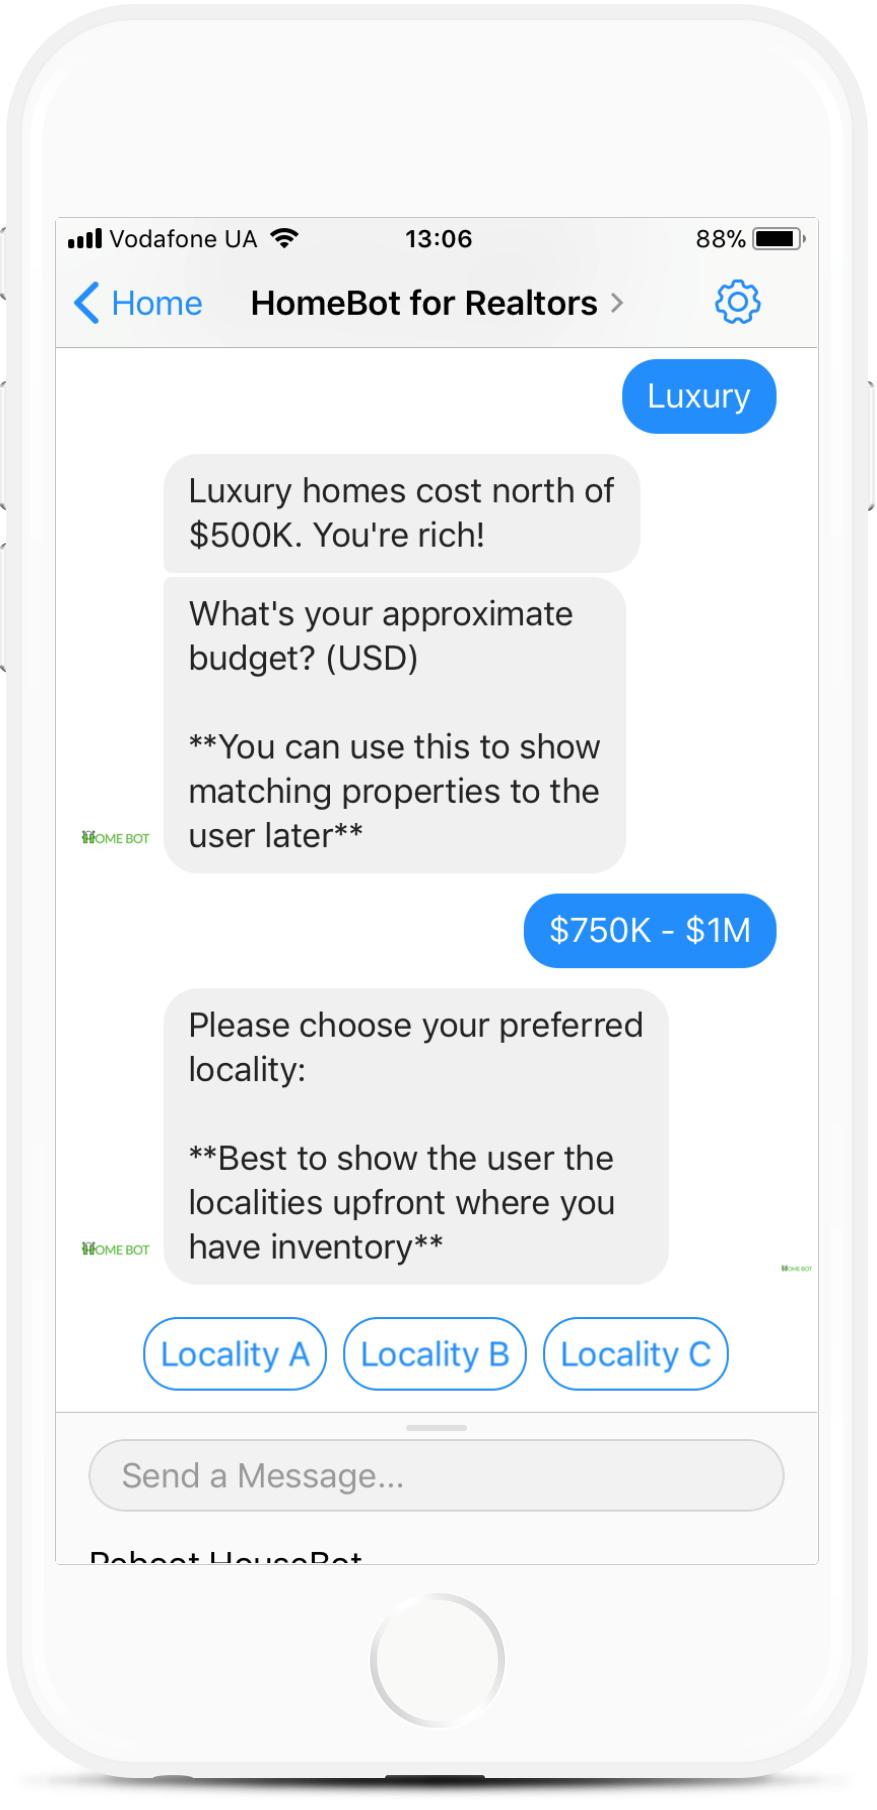 Lead Generation Bot for Realtors Dealing in Homes for $99   #messenger #bottemplates #bots #chatbots #aibots #fbmessenger #botmakers